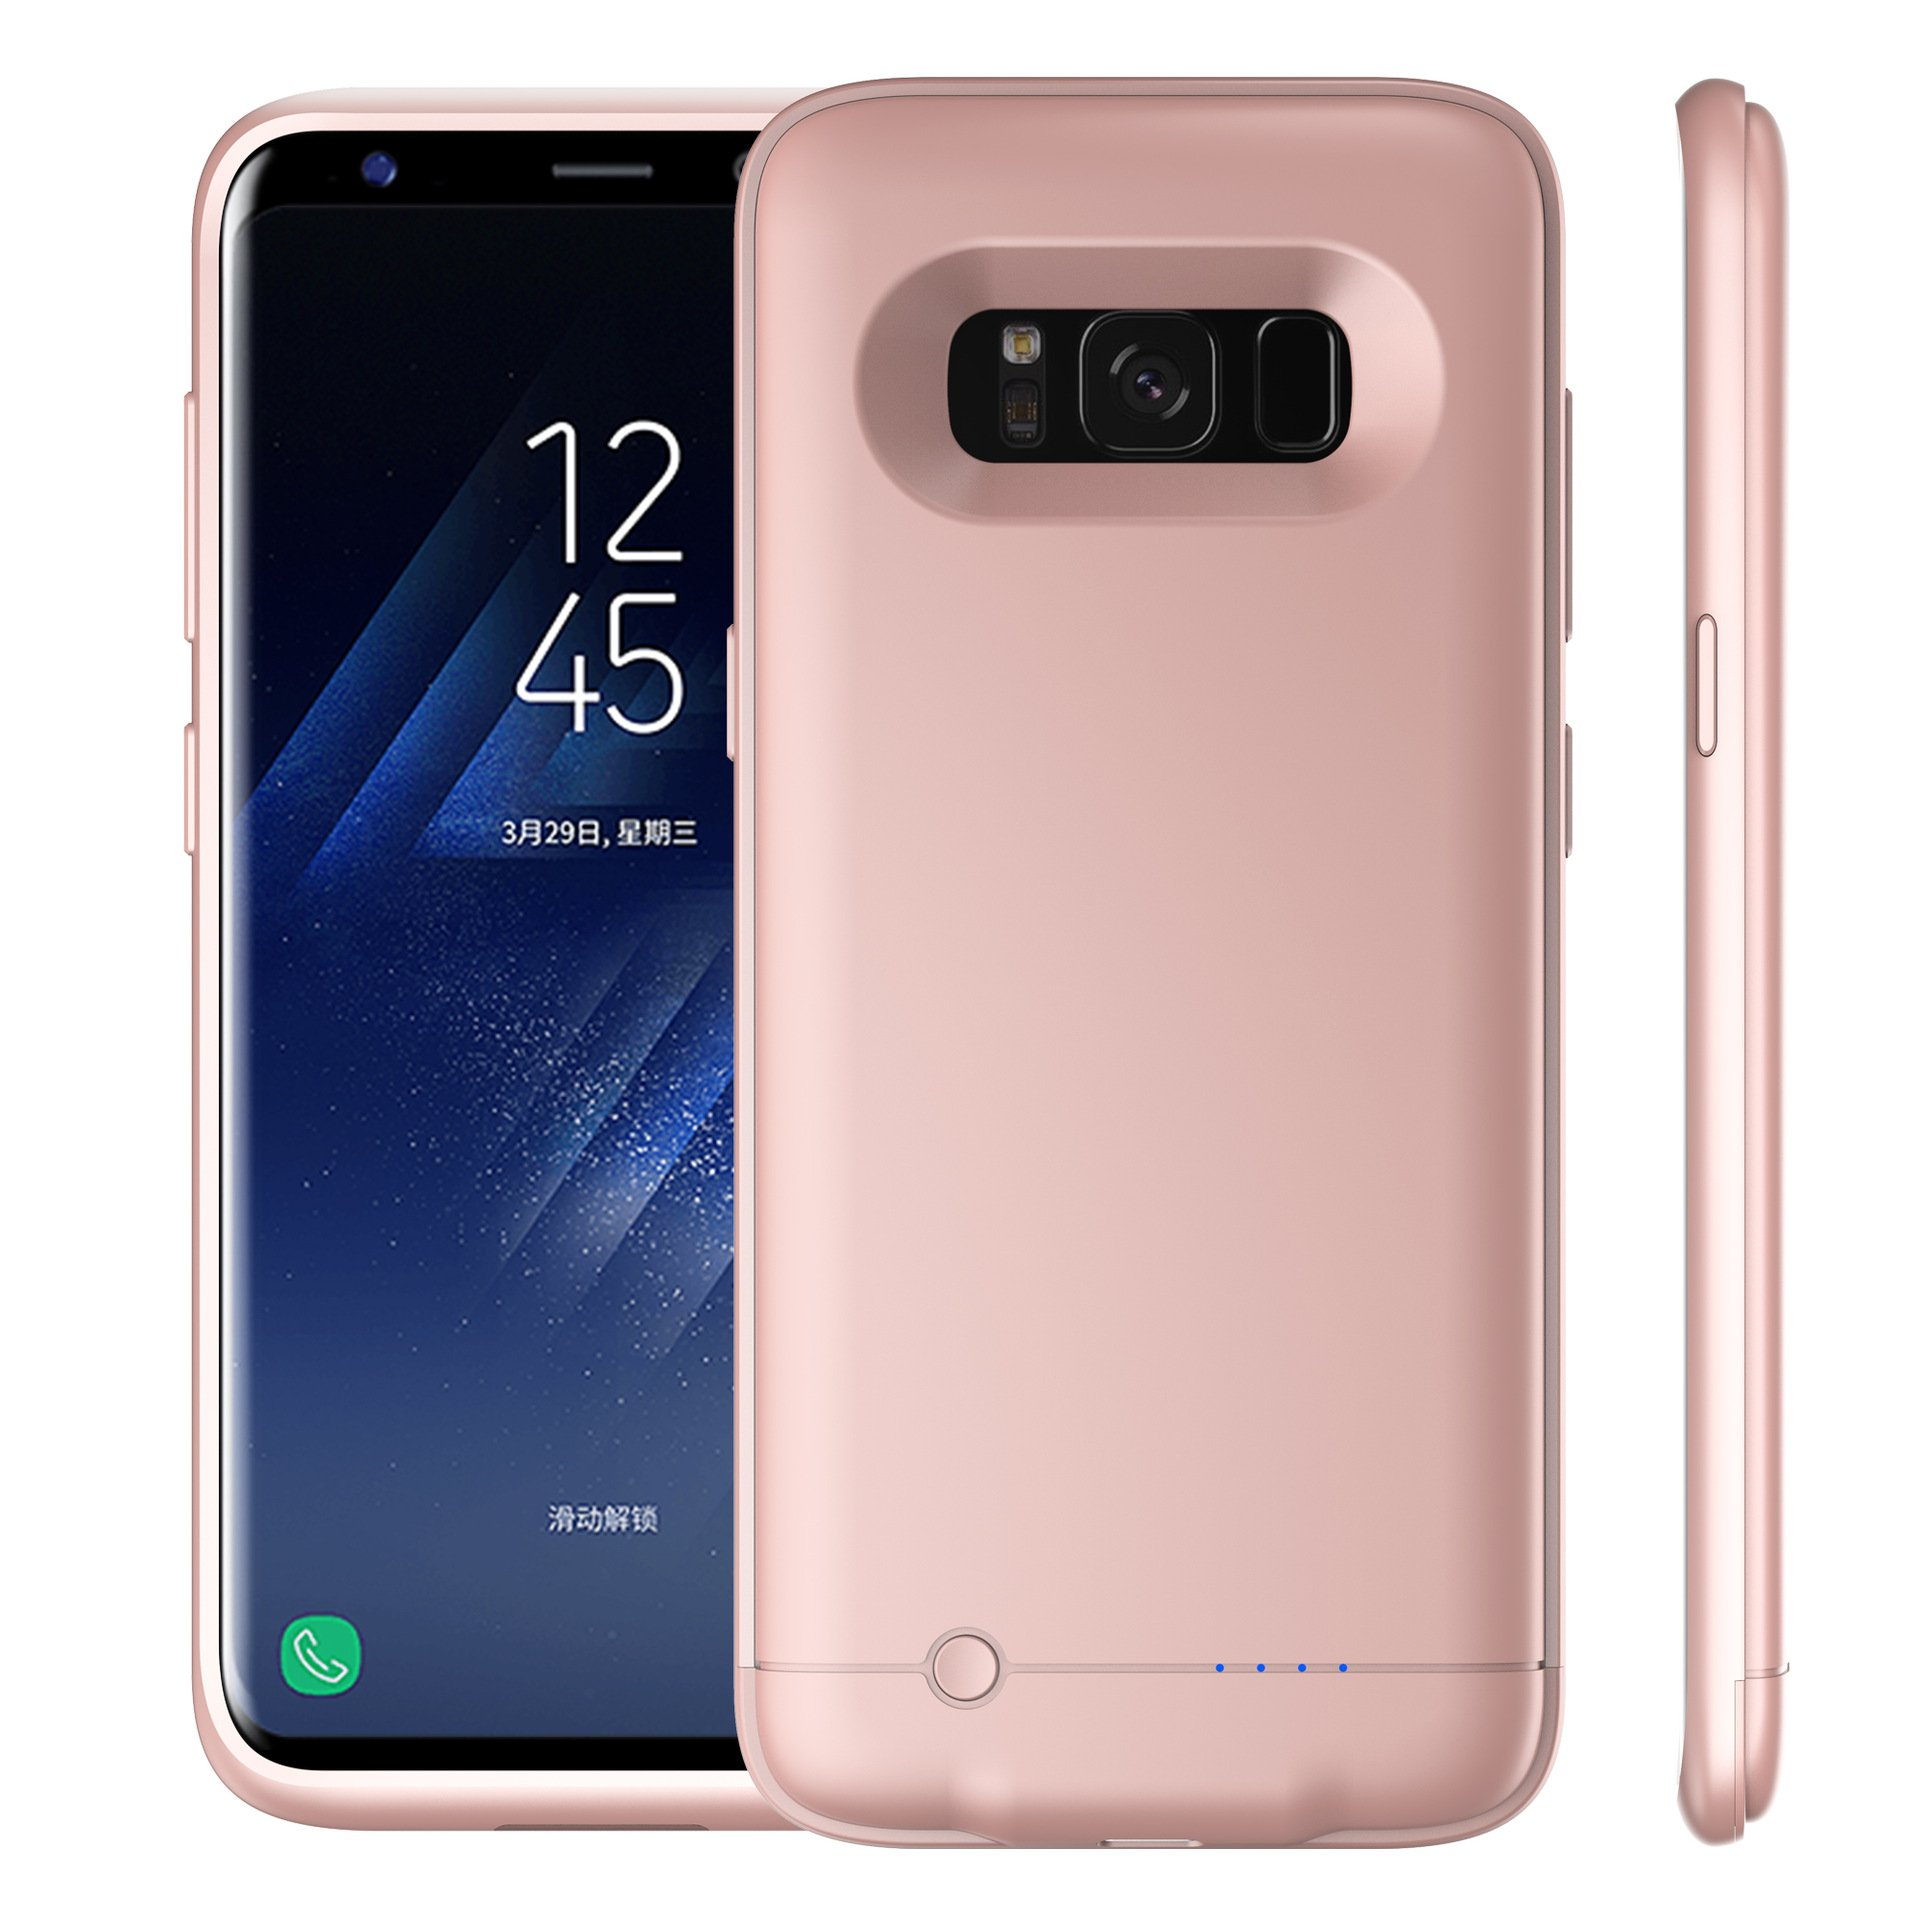 Torubia Samsung Galaxy S Lite Luxury Edition Samsung Galaxy S8 4200mAh Battery Case, Cover External Protective Battery Cover Samsung Galaxy S Lite Luxury Edition Samsung Galaxy S8 4200mAh